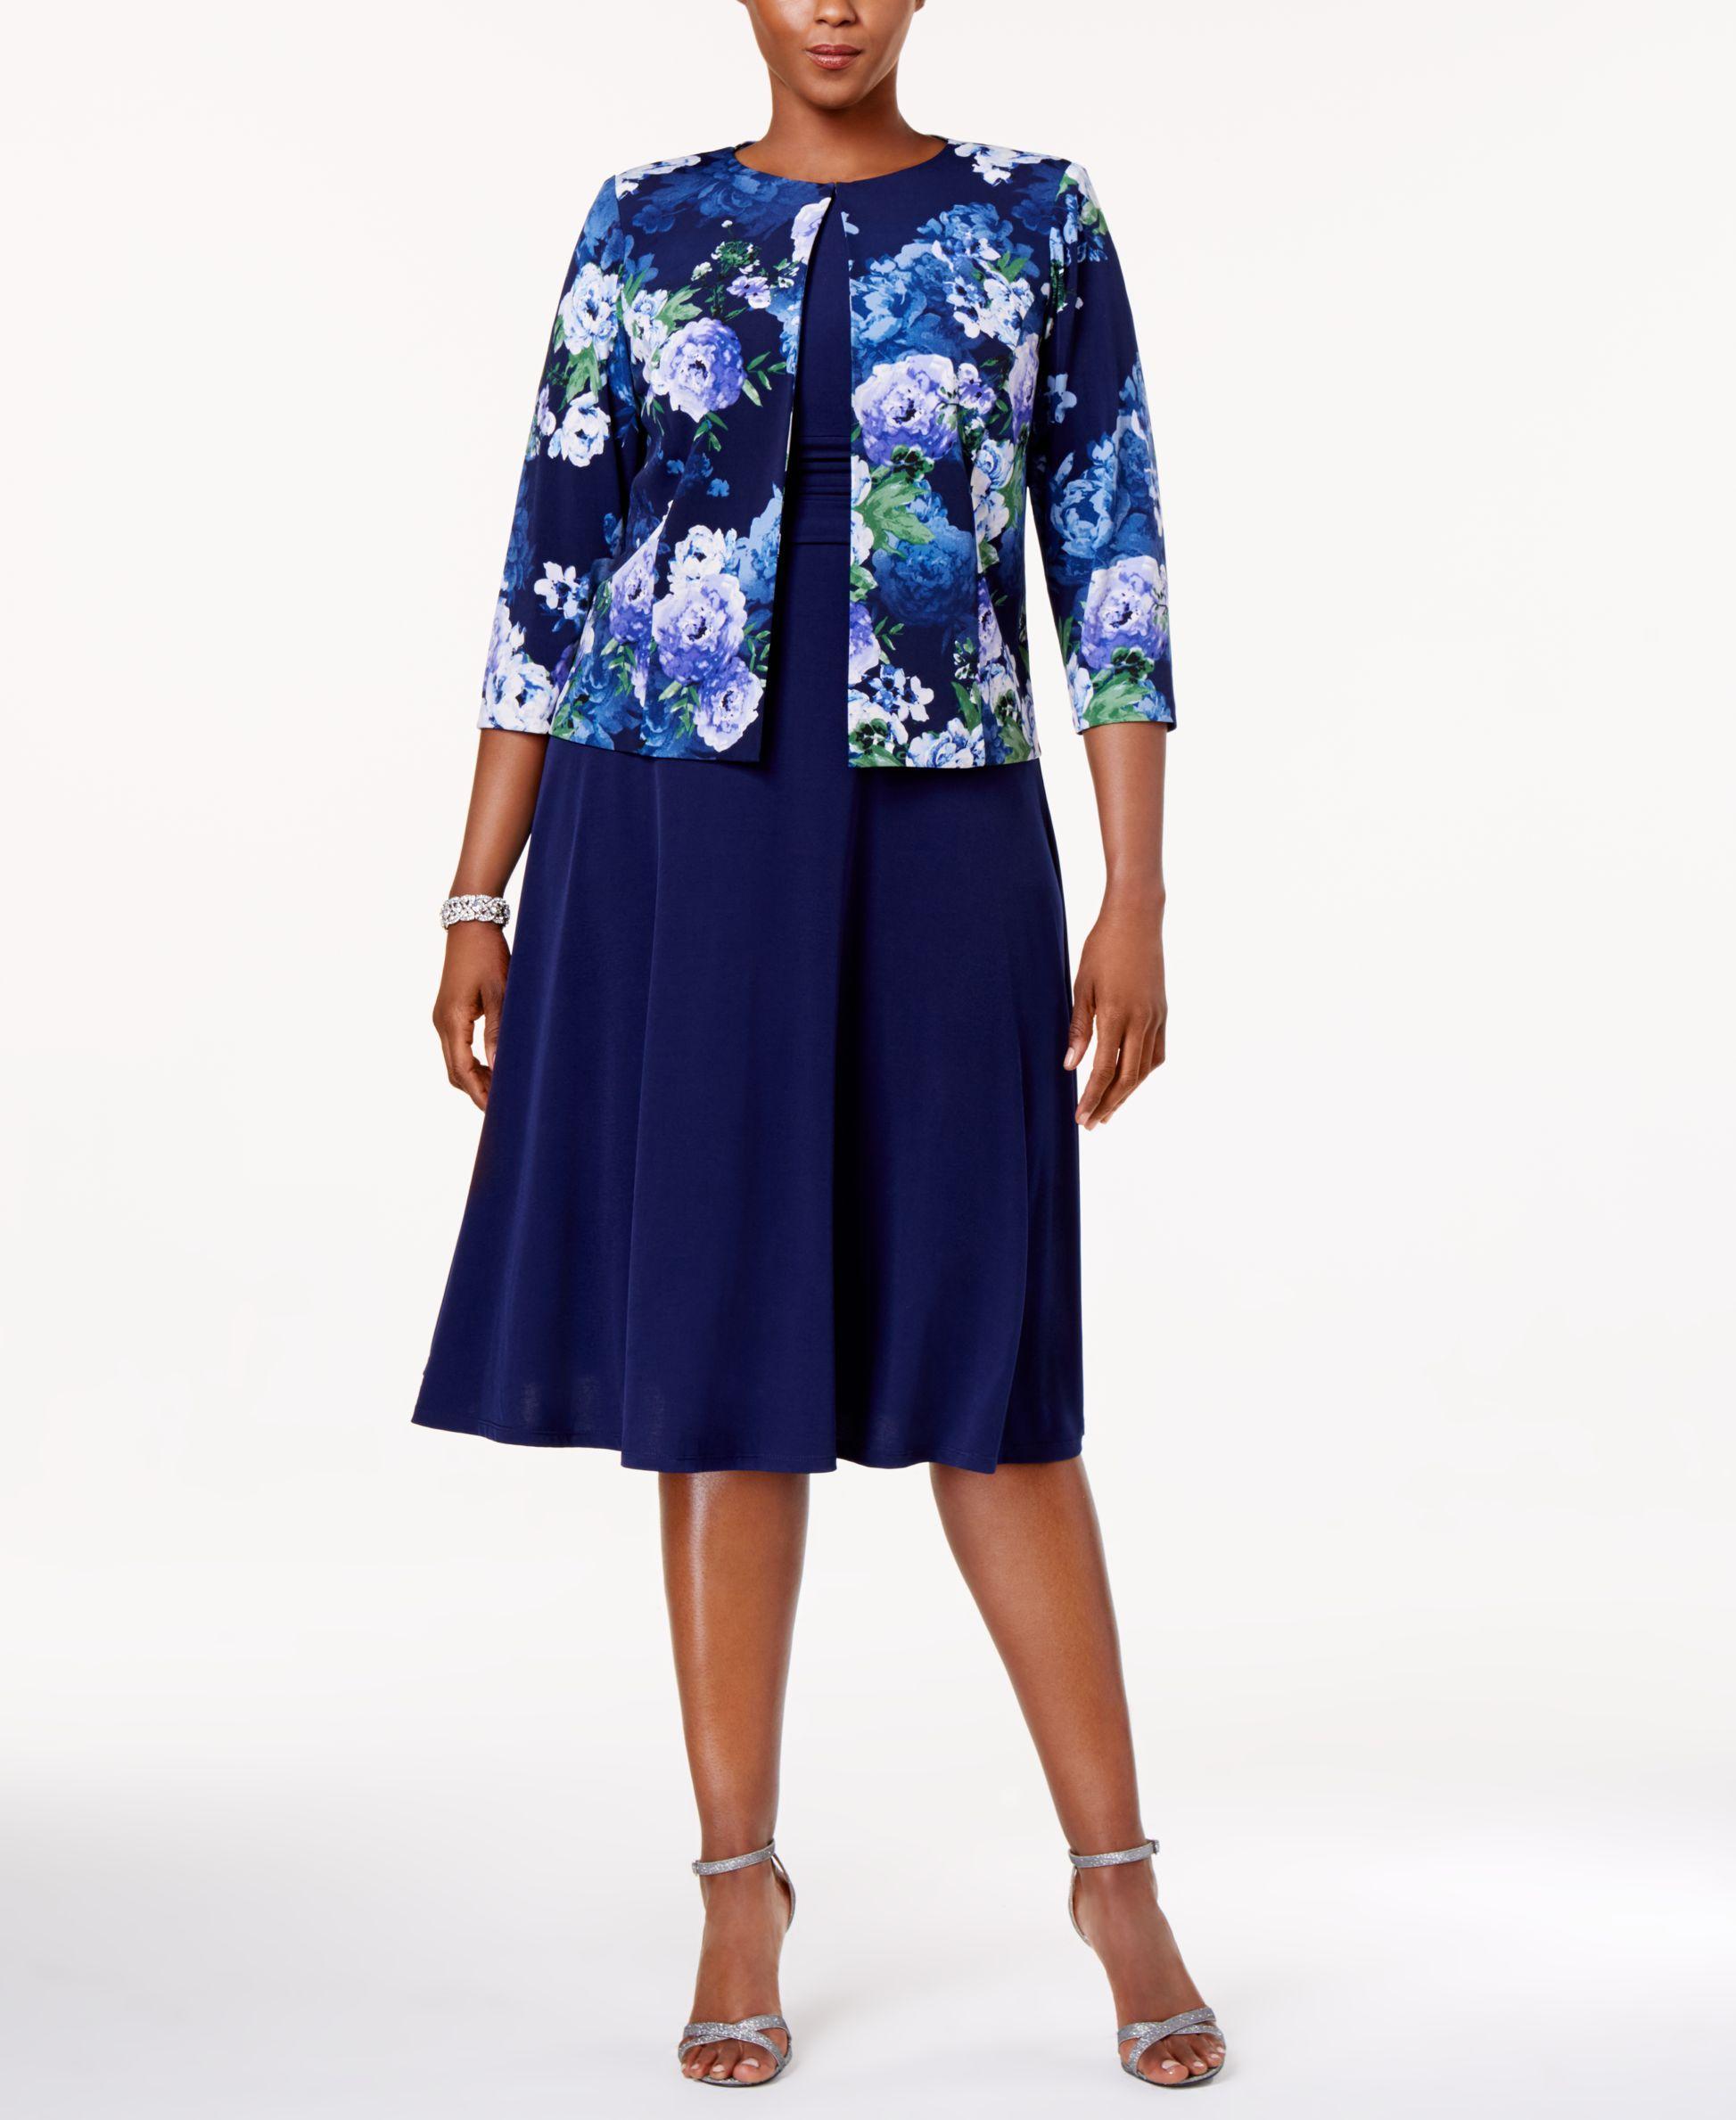 c6fc11835a1ad Jessica Howard Plus Size Empire-Waist Dress   Printed Jacket